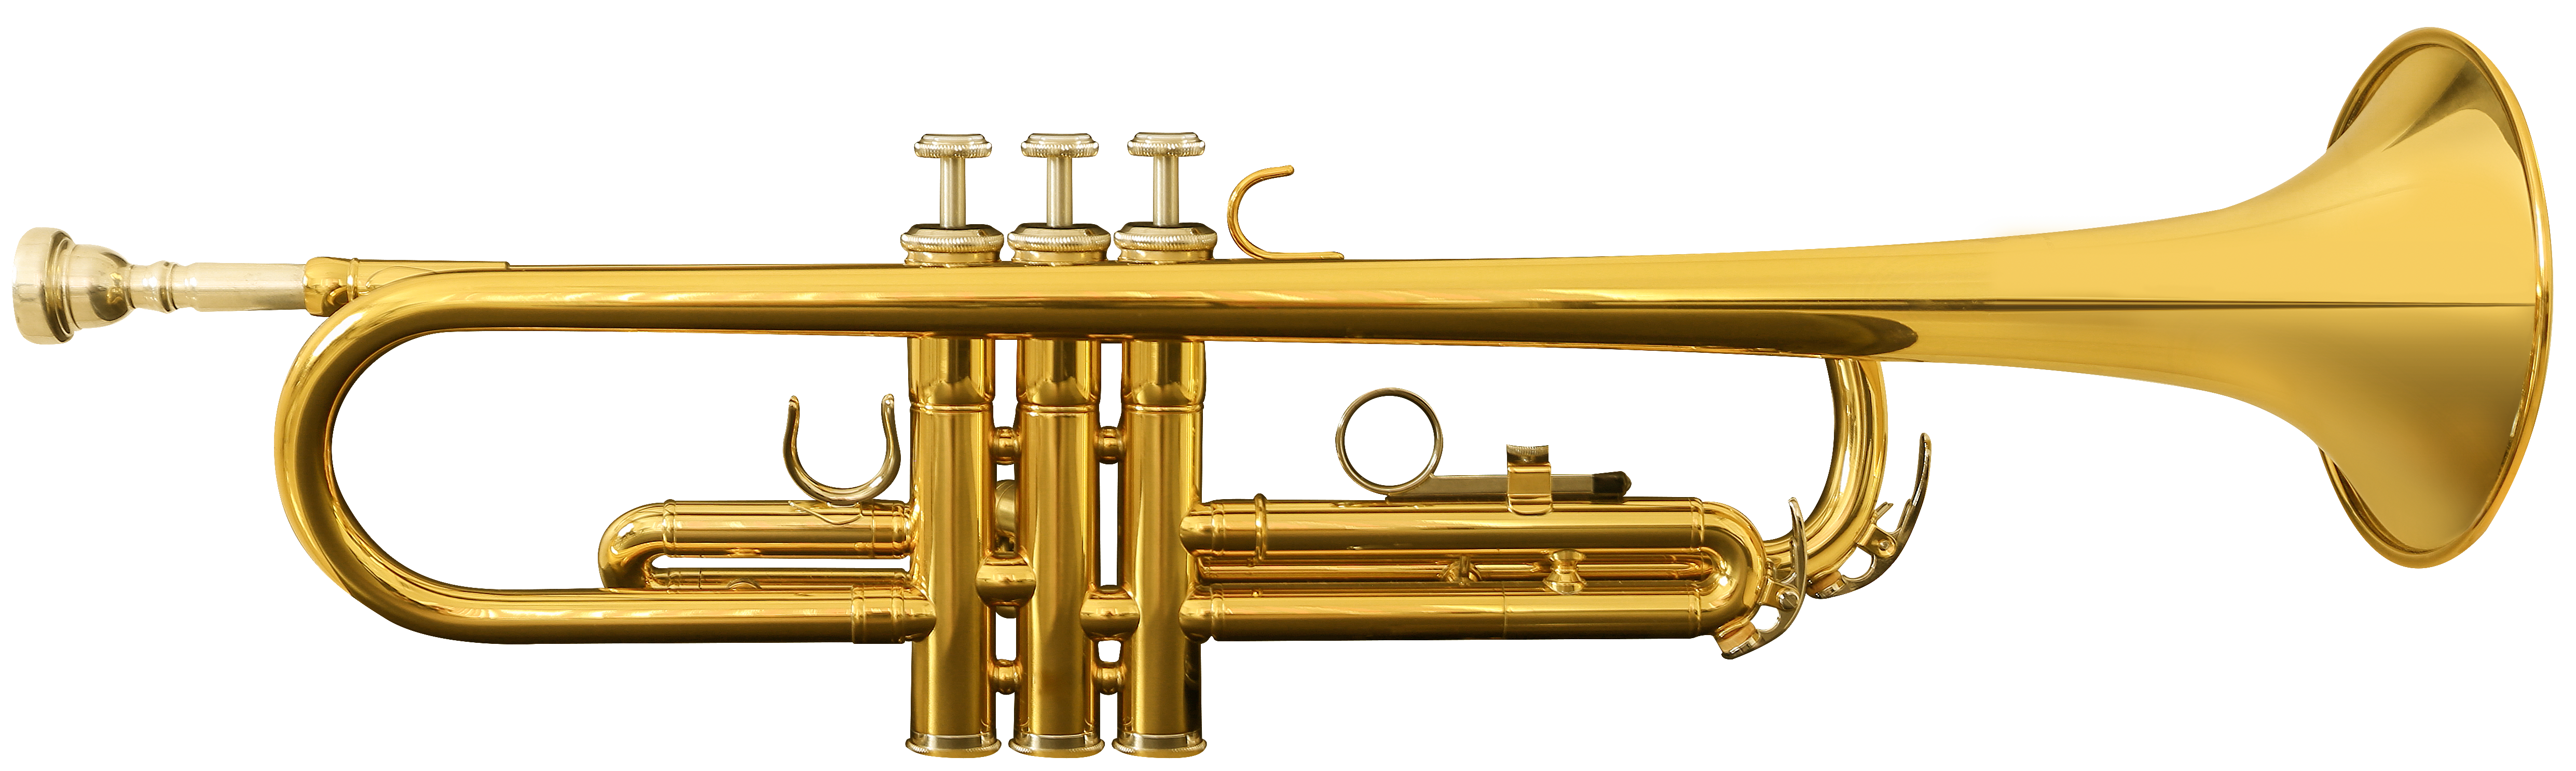 Clipart key brass. Trumpet transparent clip art